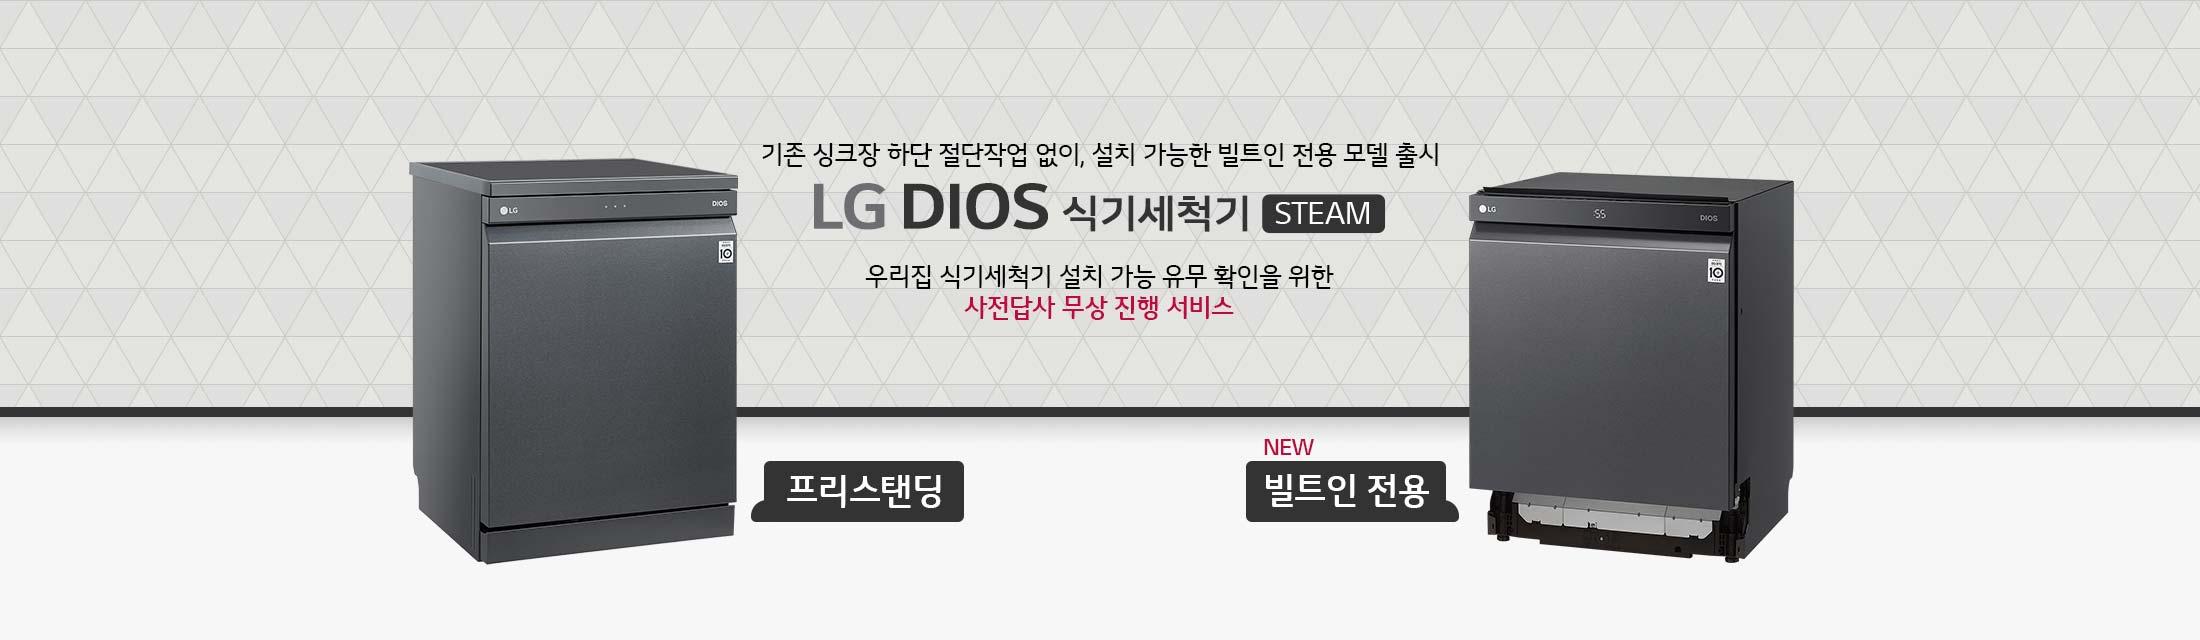 LG 디오스 식기세척기 최대 6개월 무료